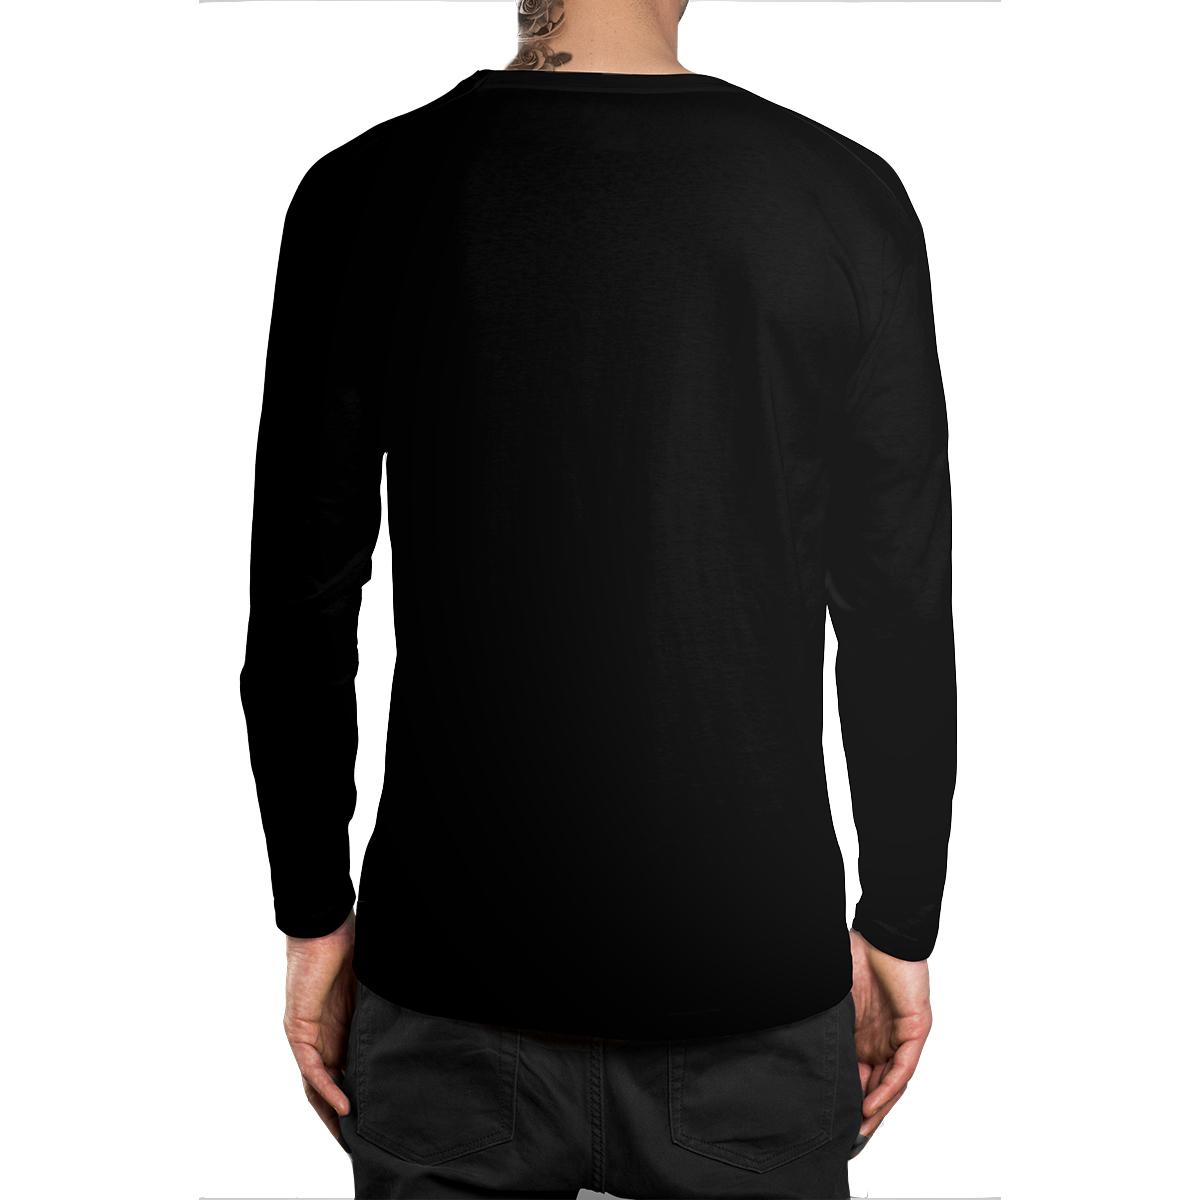 Stompy Camiseta Manga Longa Modelo 25